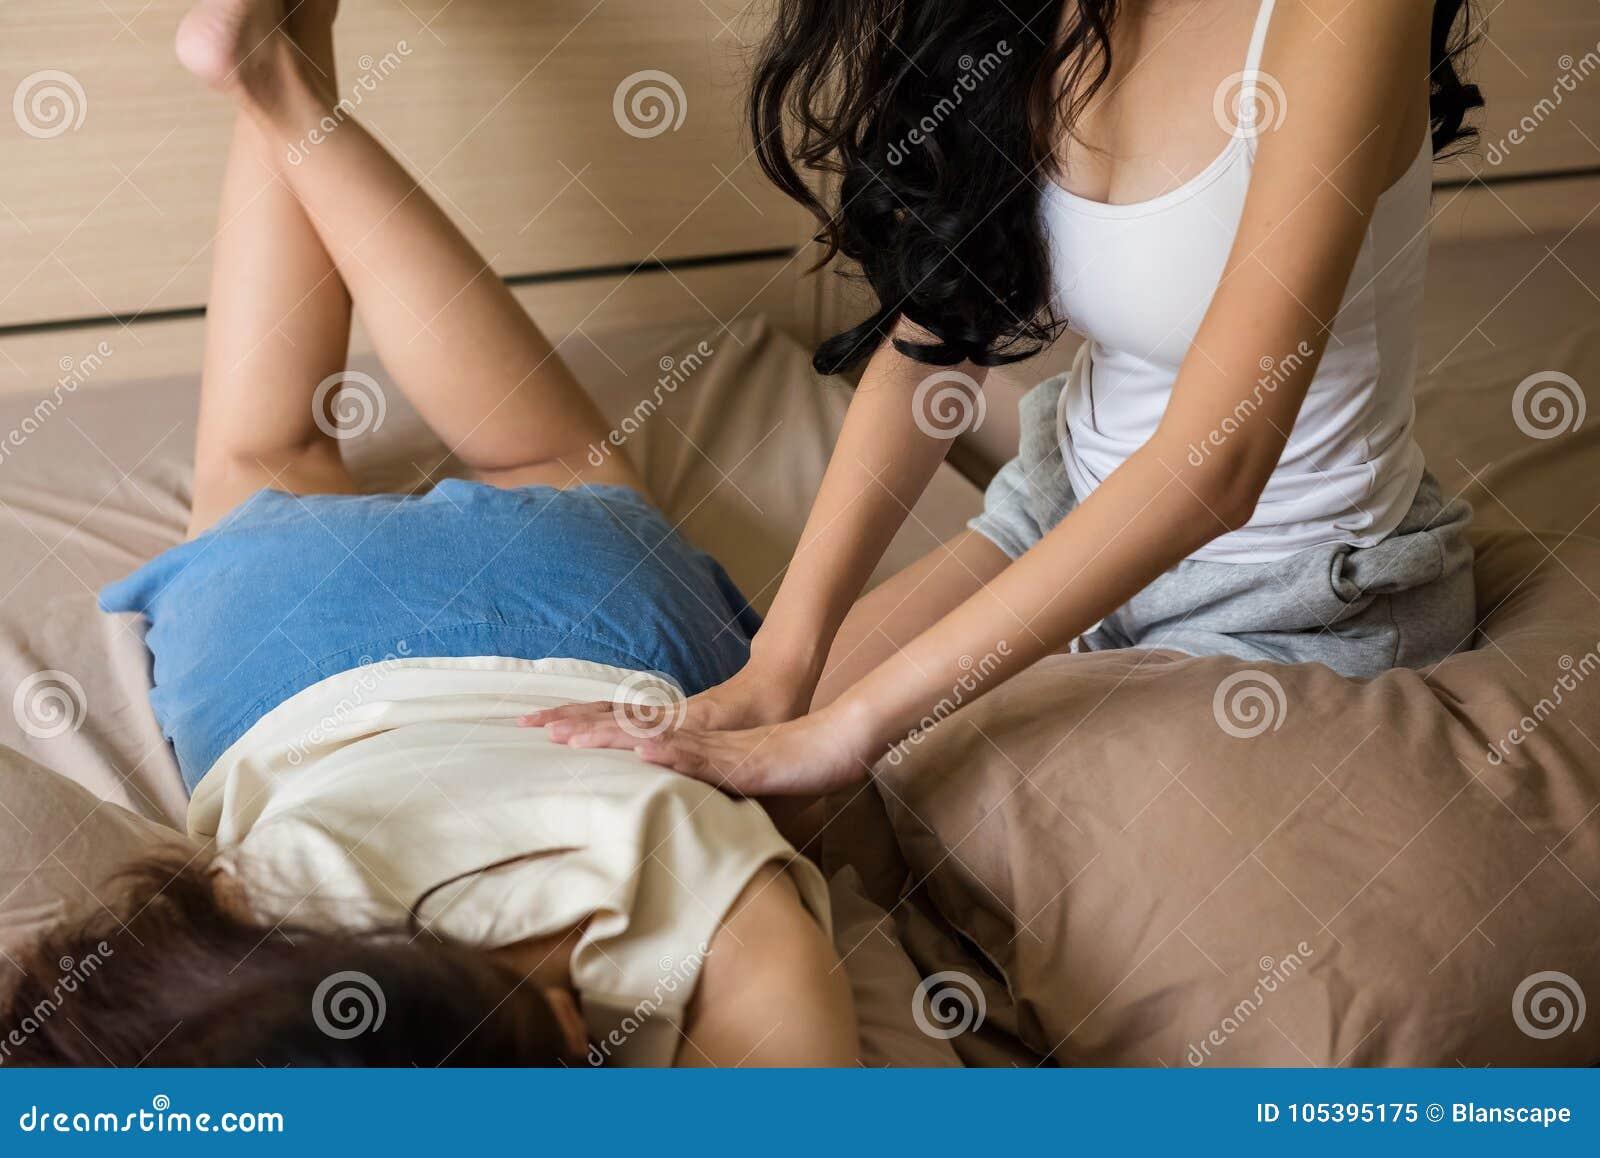 Massagem Lesbica